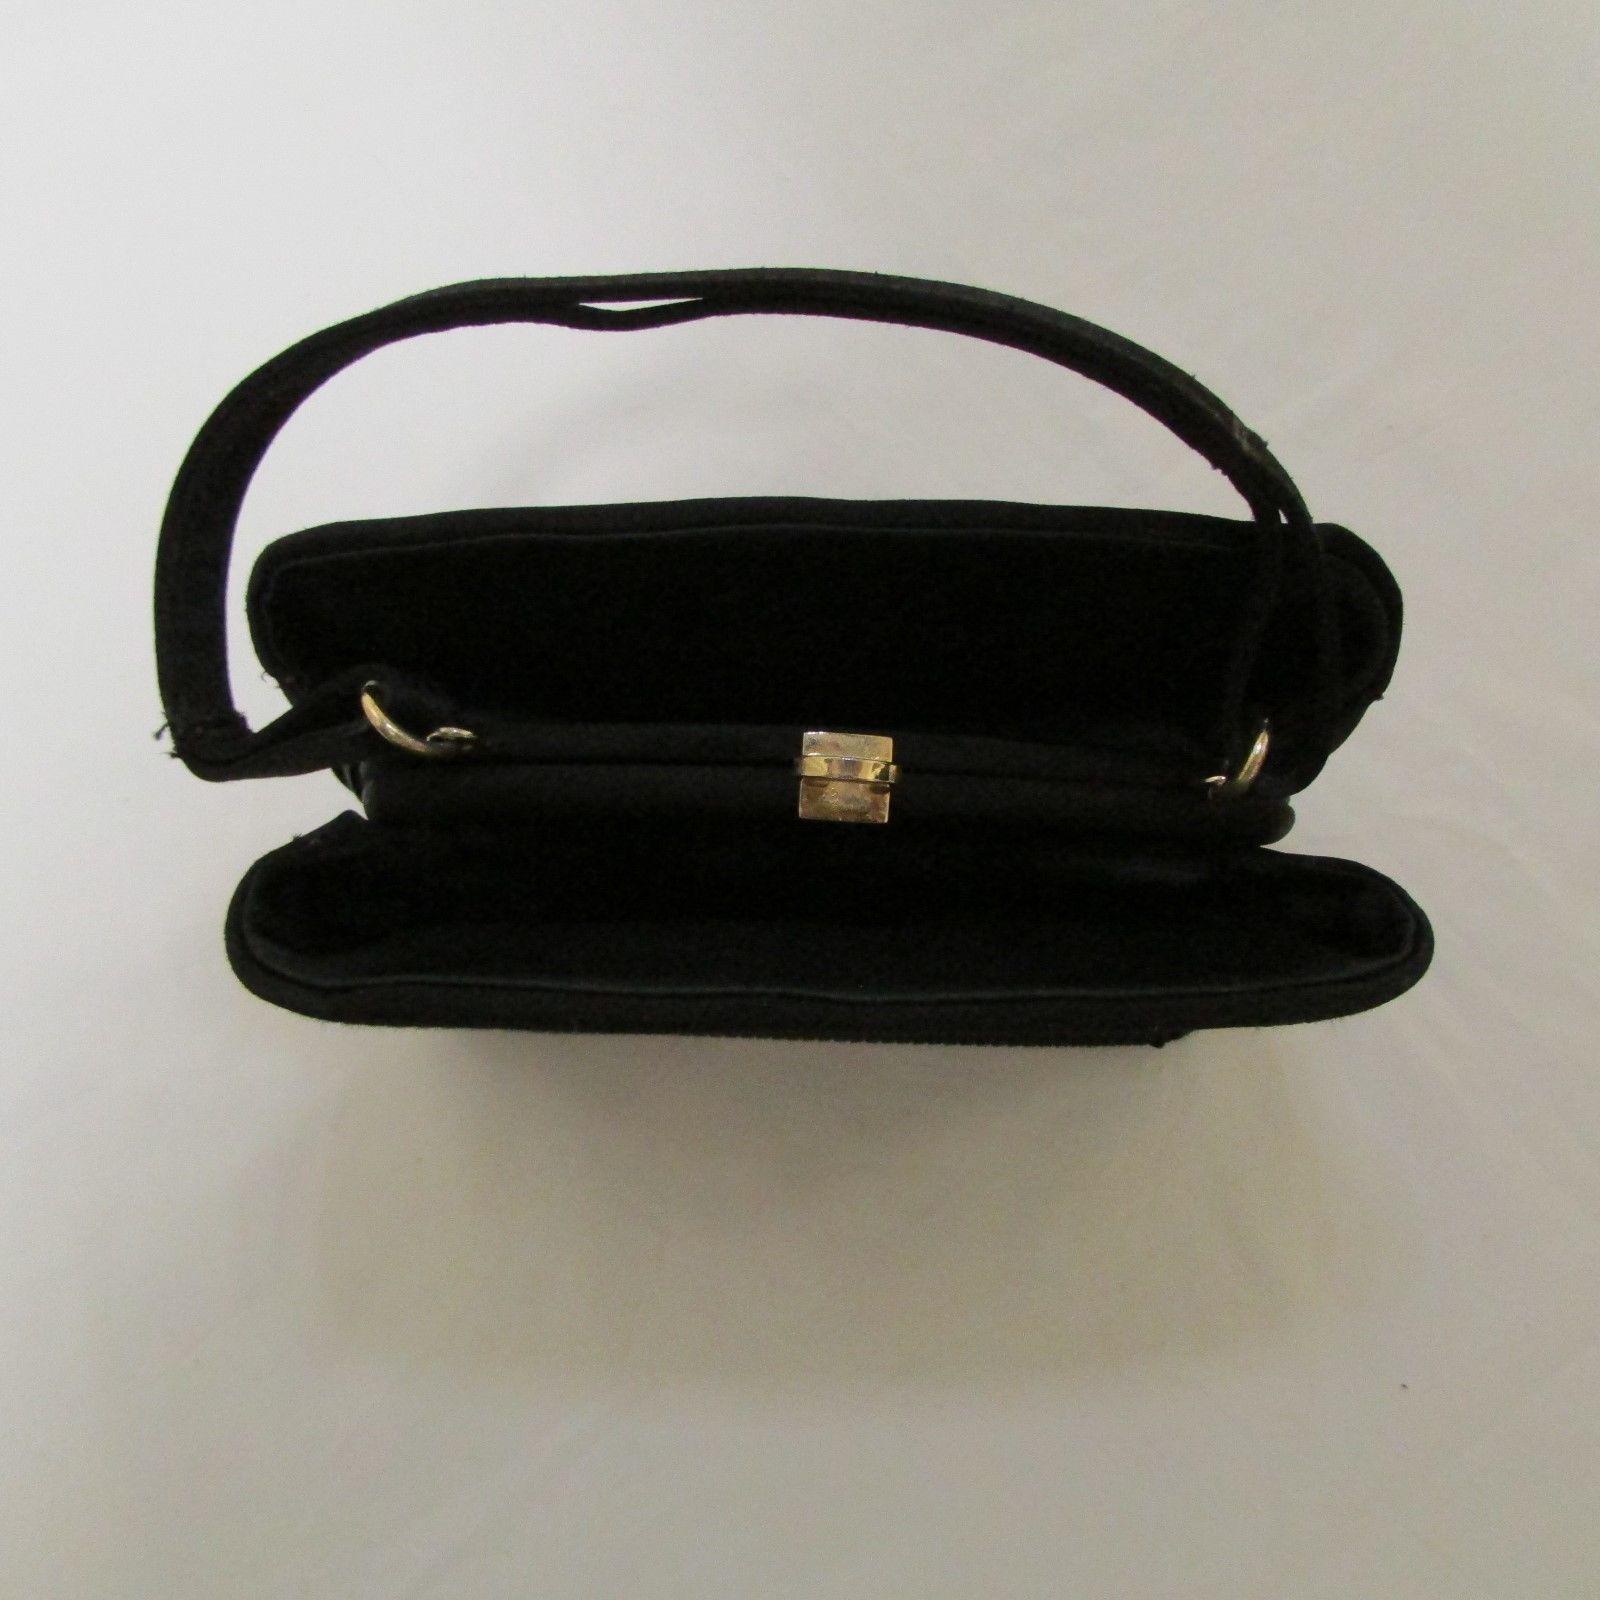 Black Satin 3 Section Small Evening Bag image 5